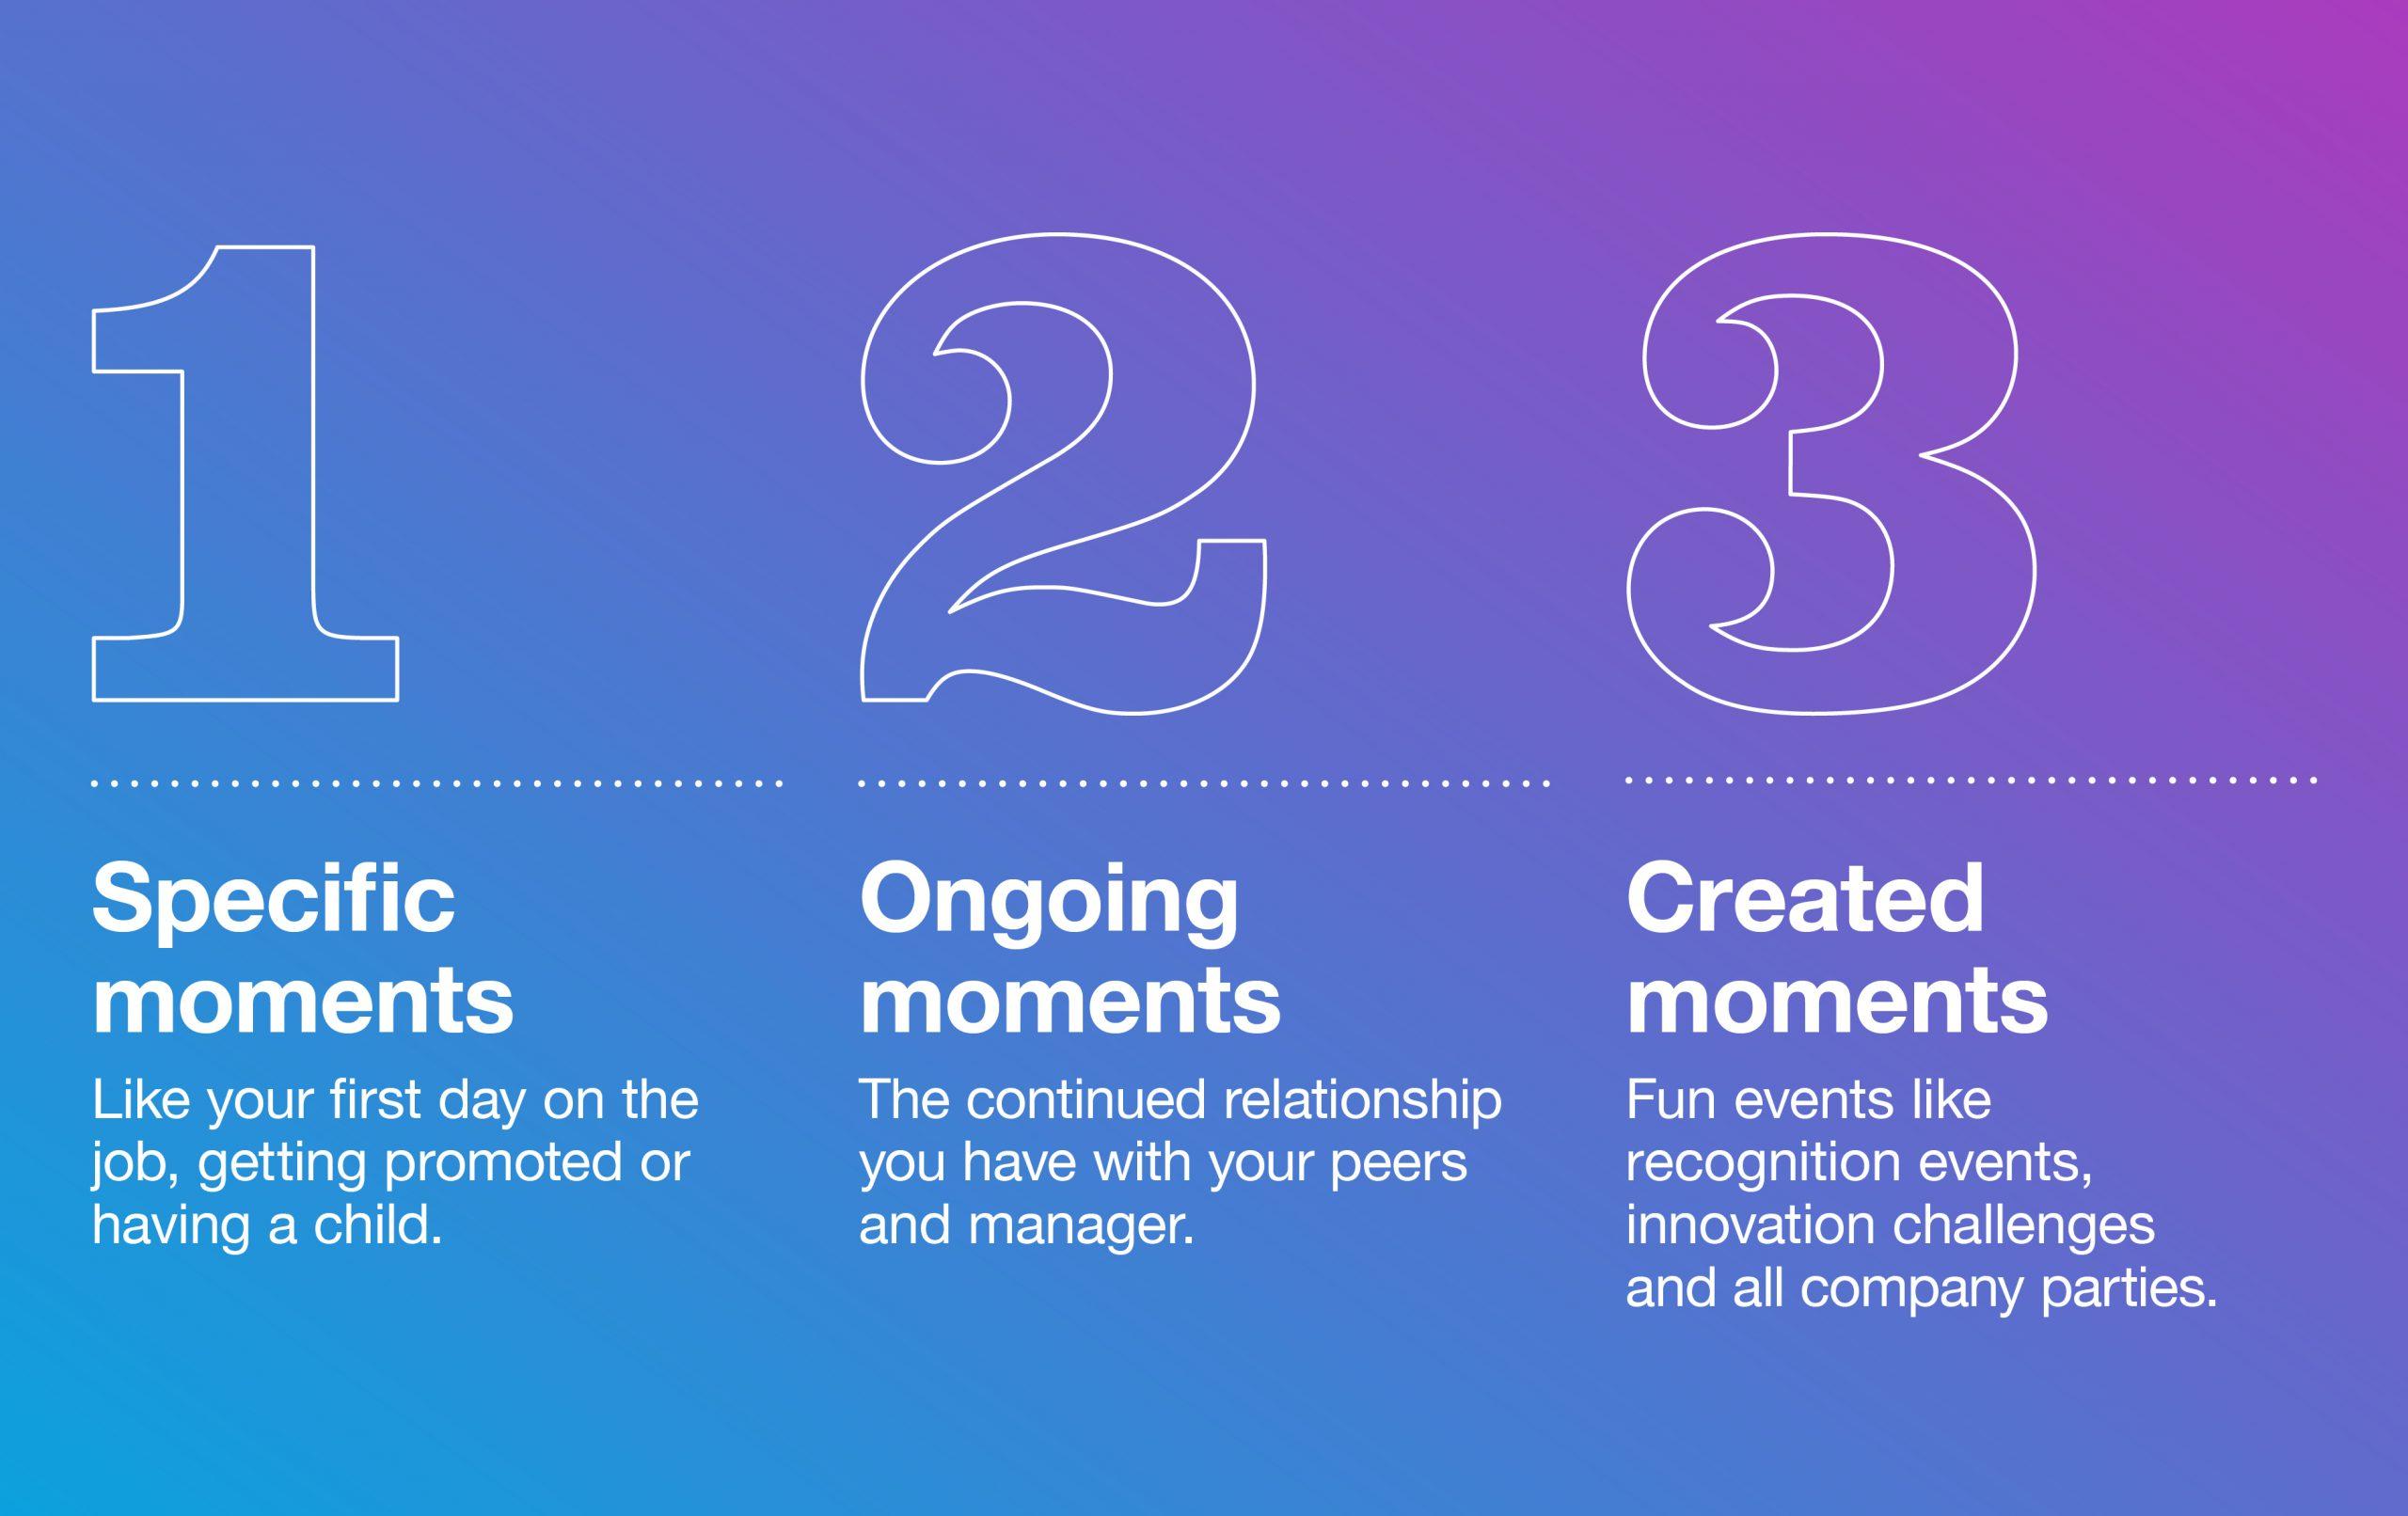 Employee moments that matter